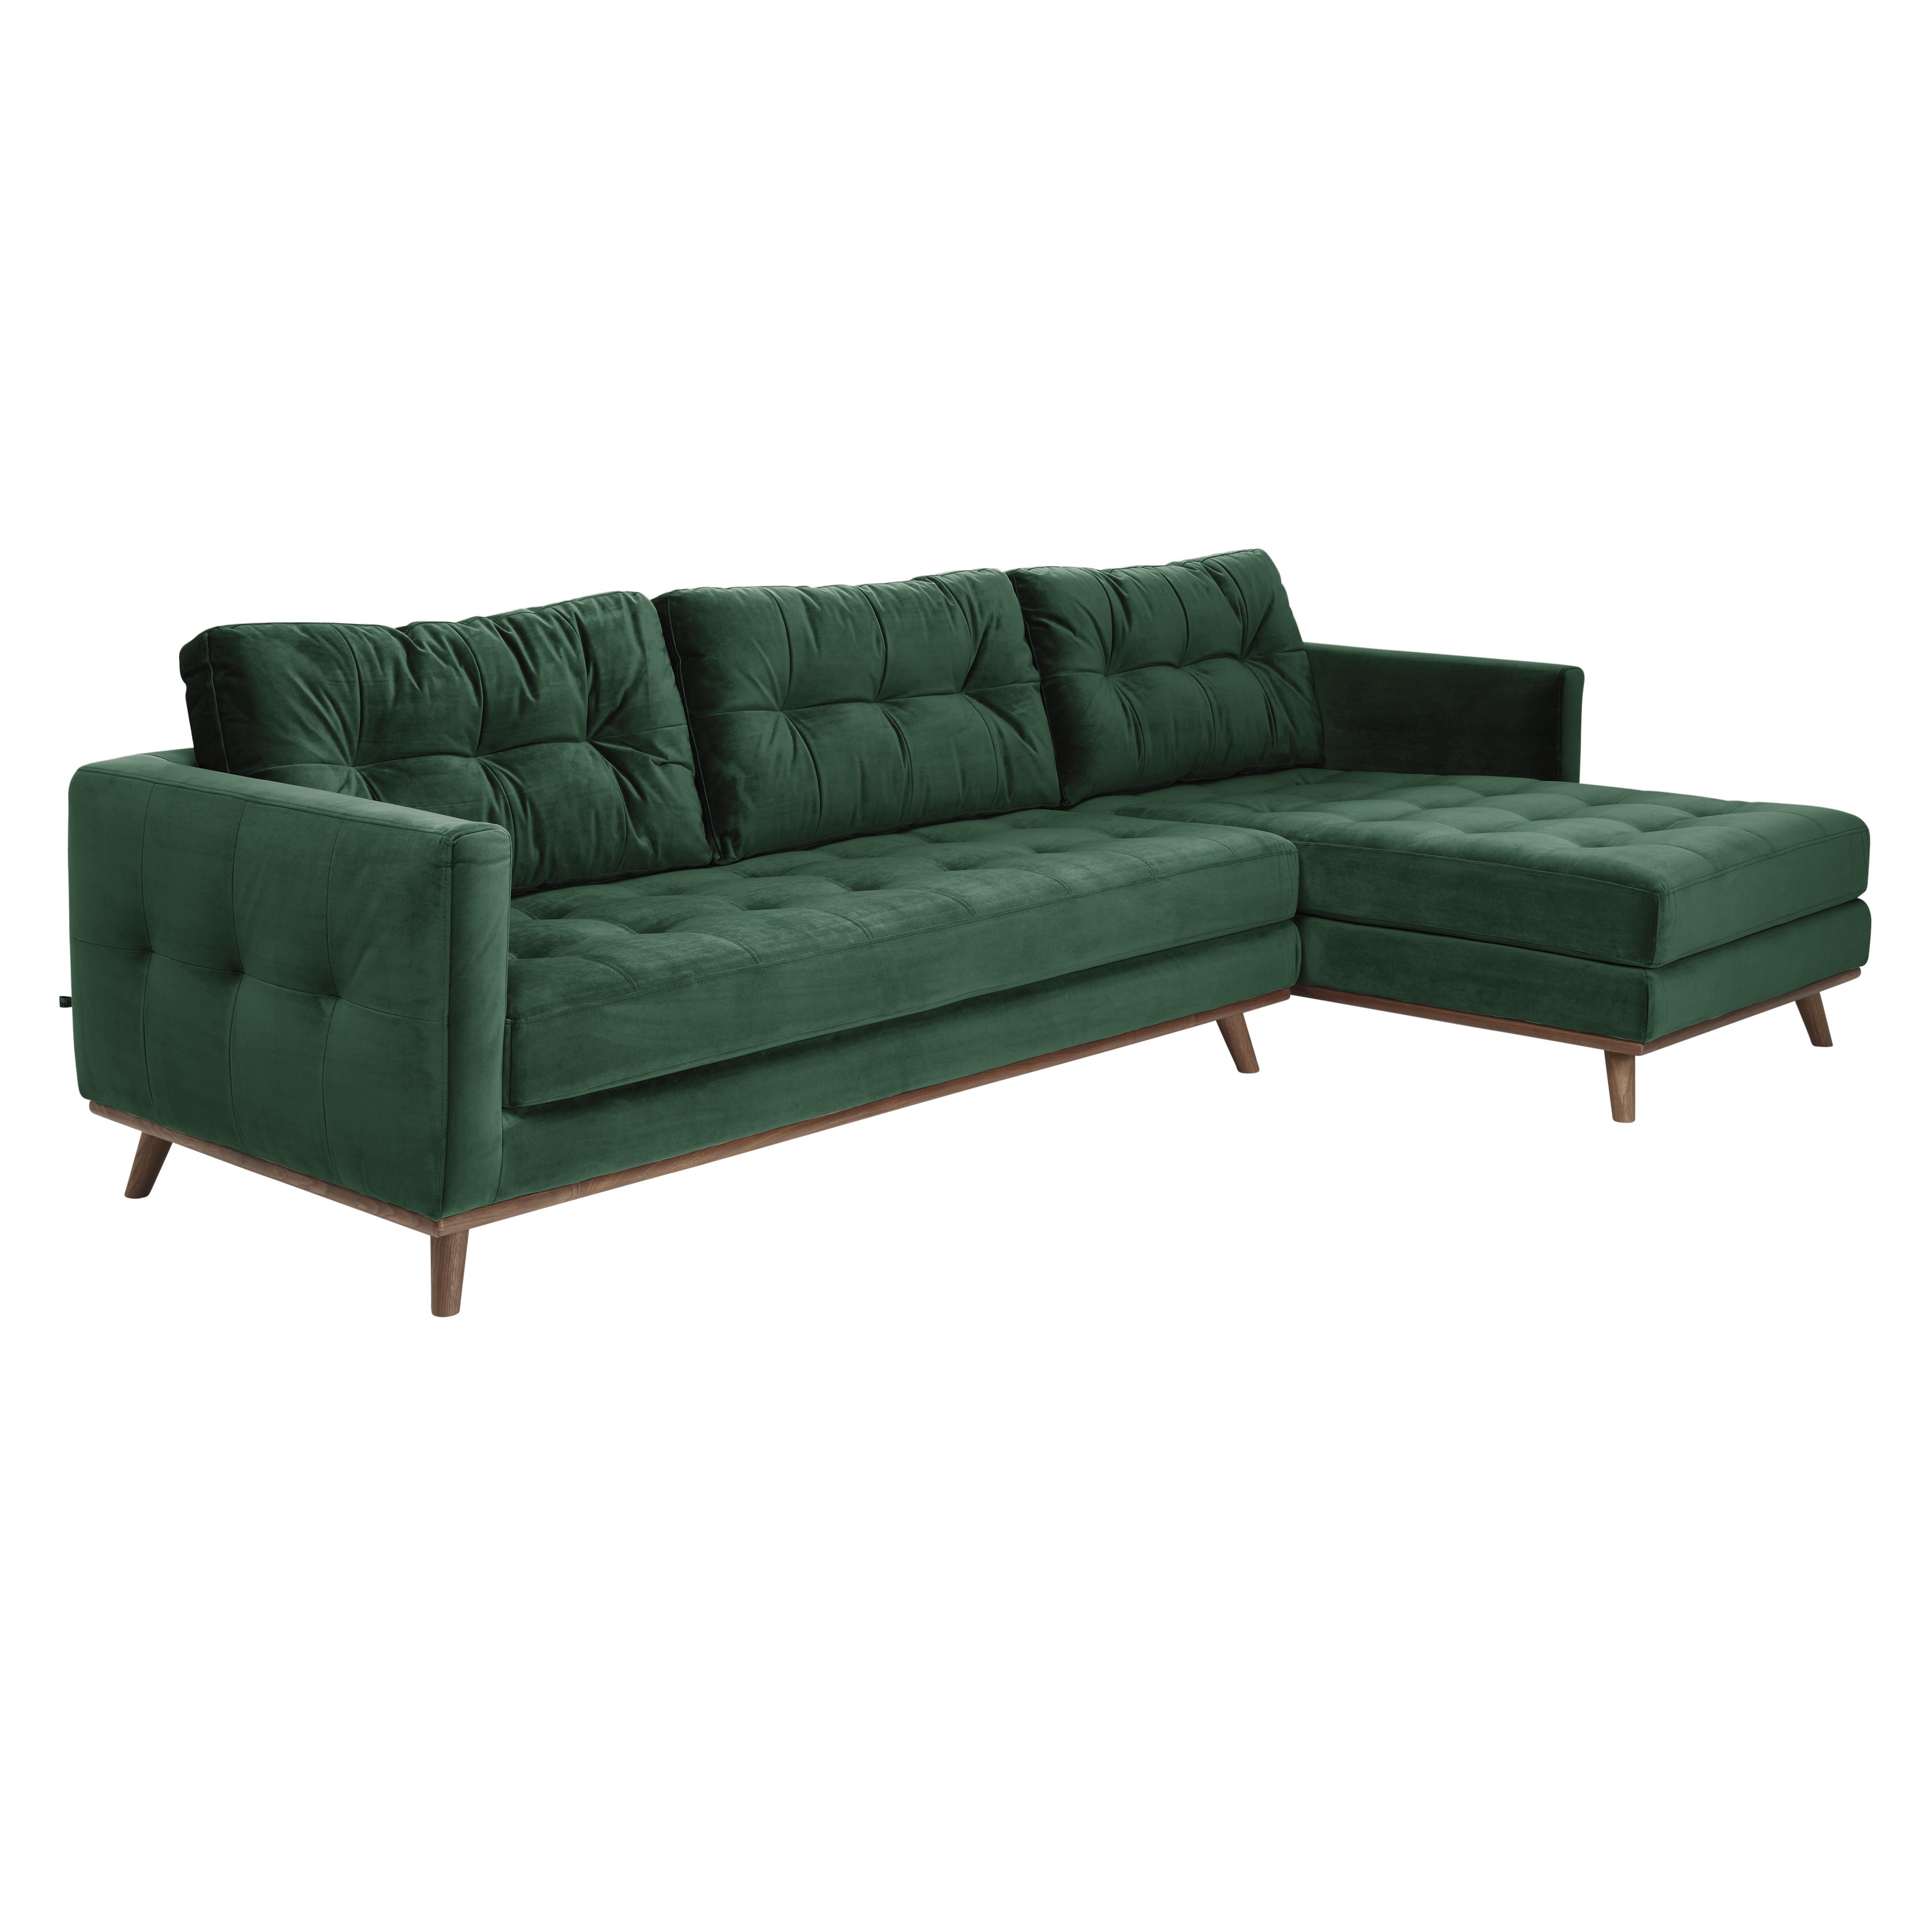 Albi right hand facing four seater chaise sofa alba velvet forest green